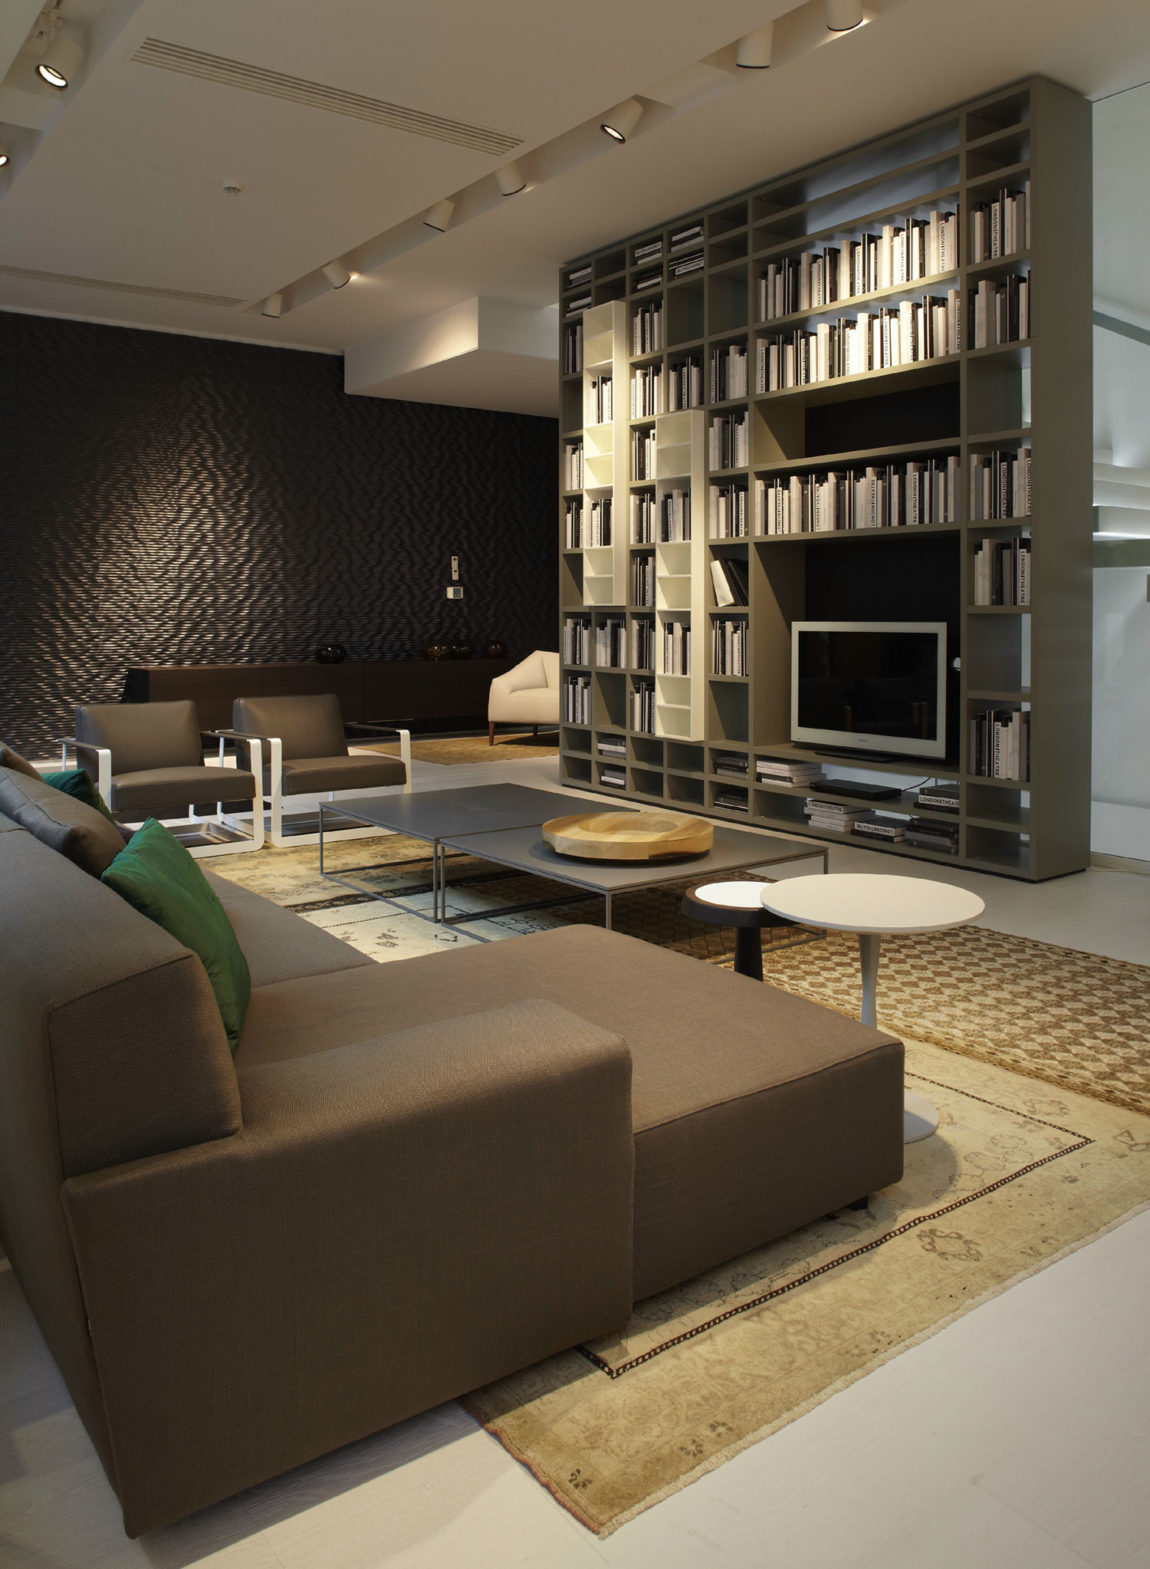 Poliform Showroom Paris by Bestetti Associati Studio (2)